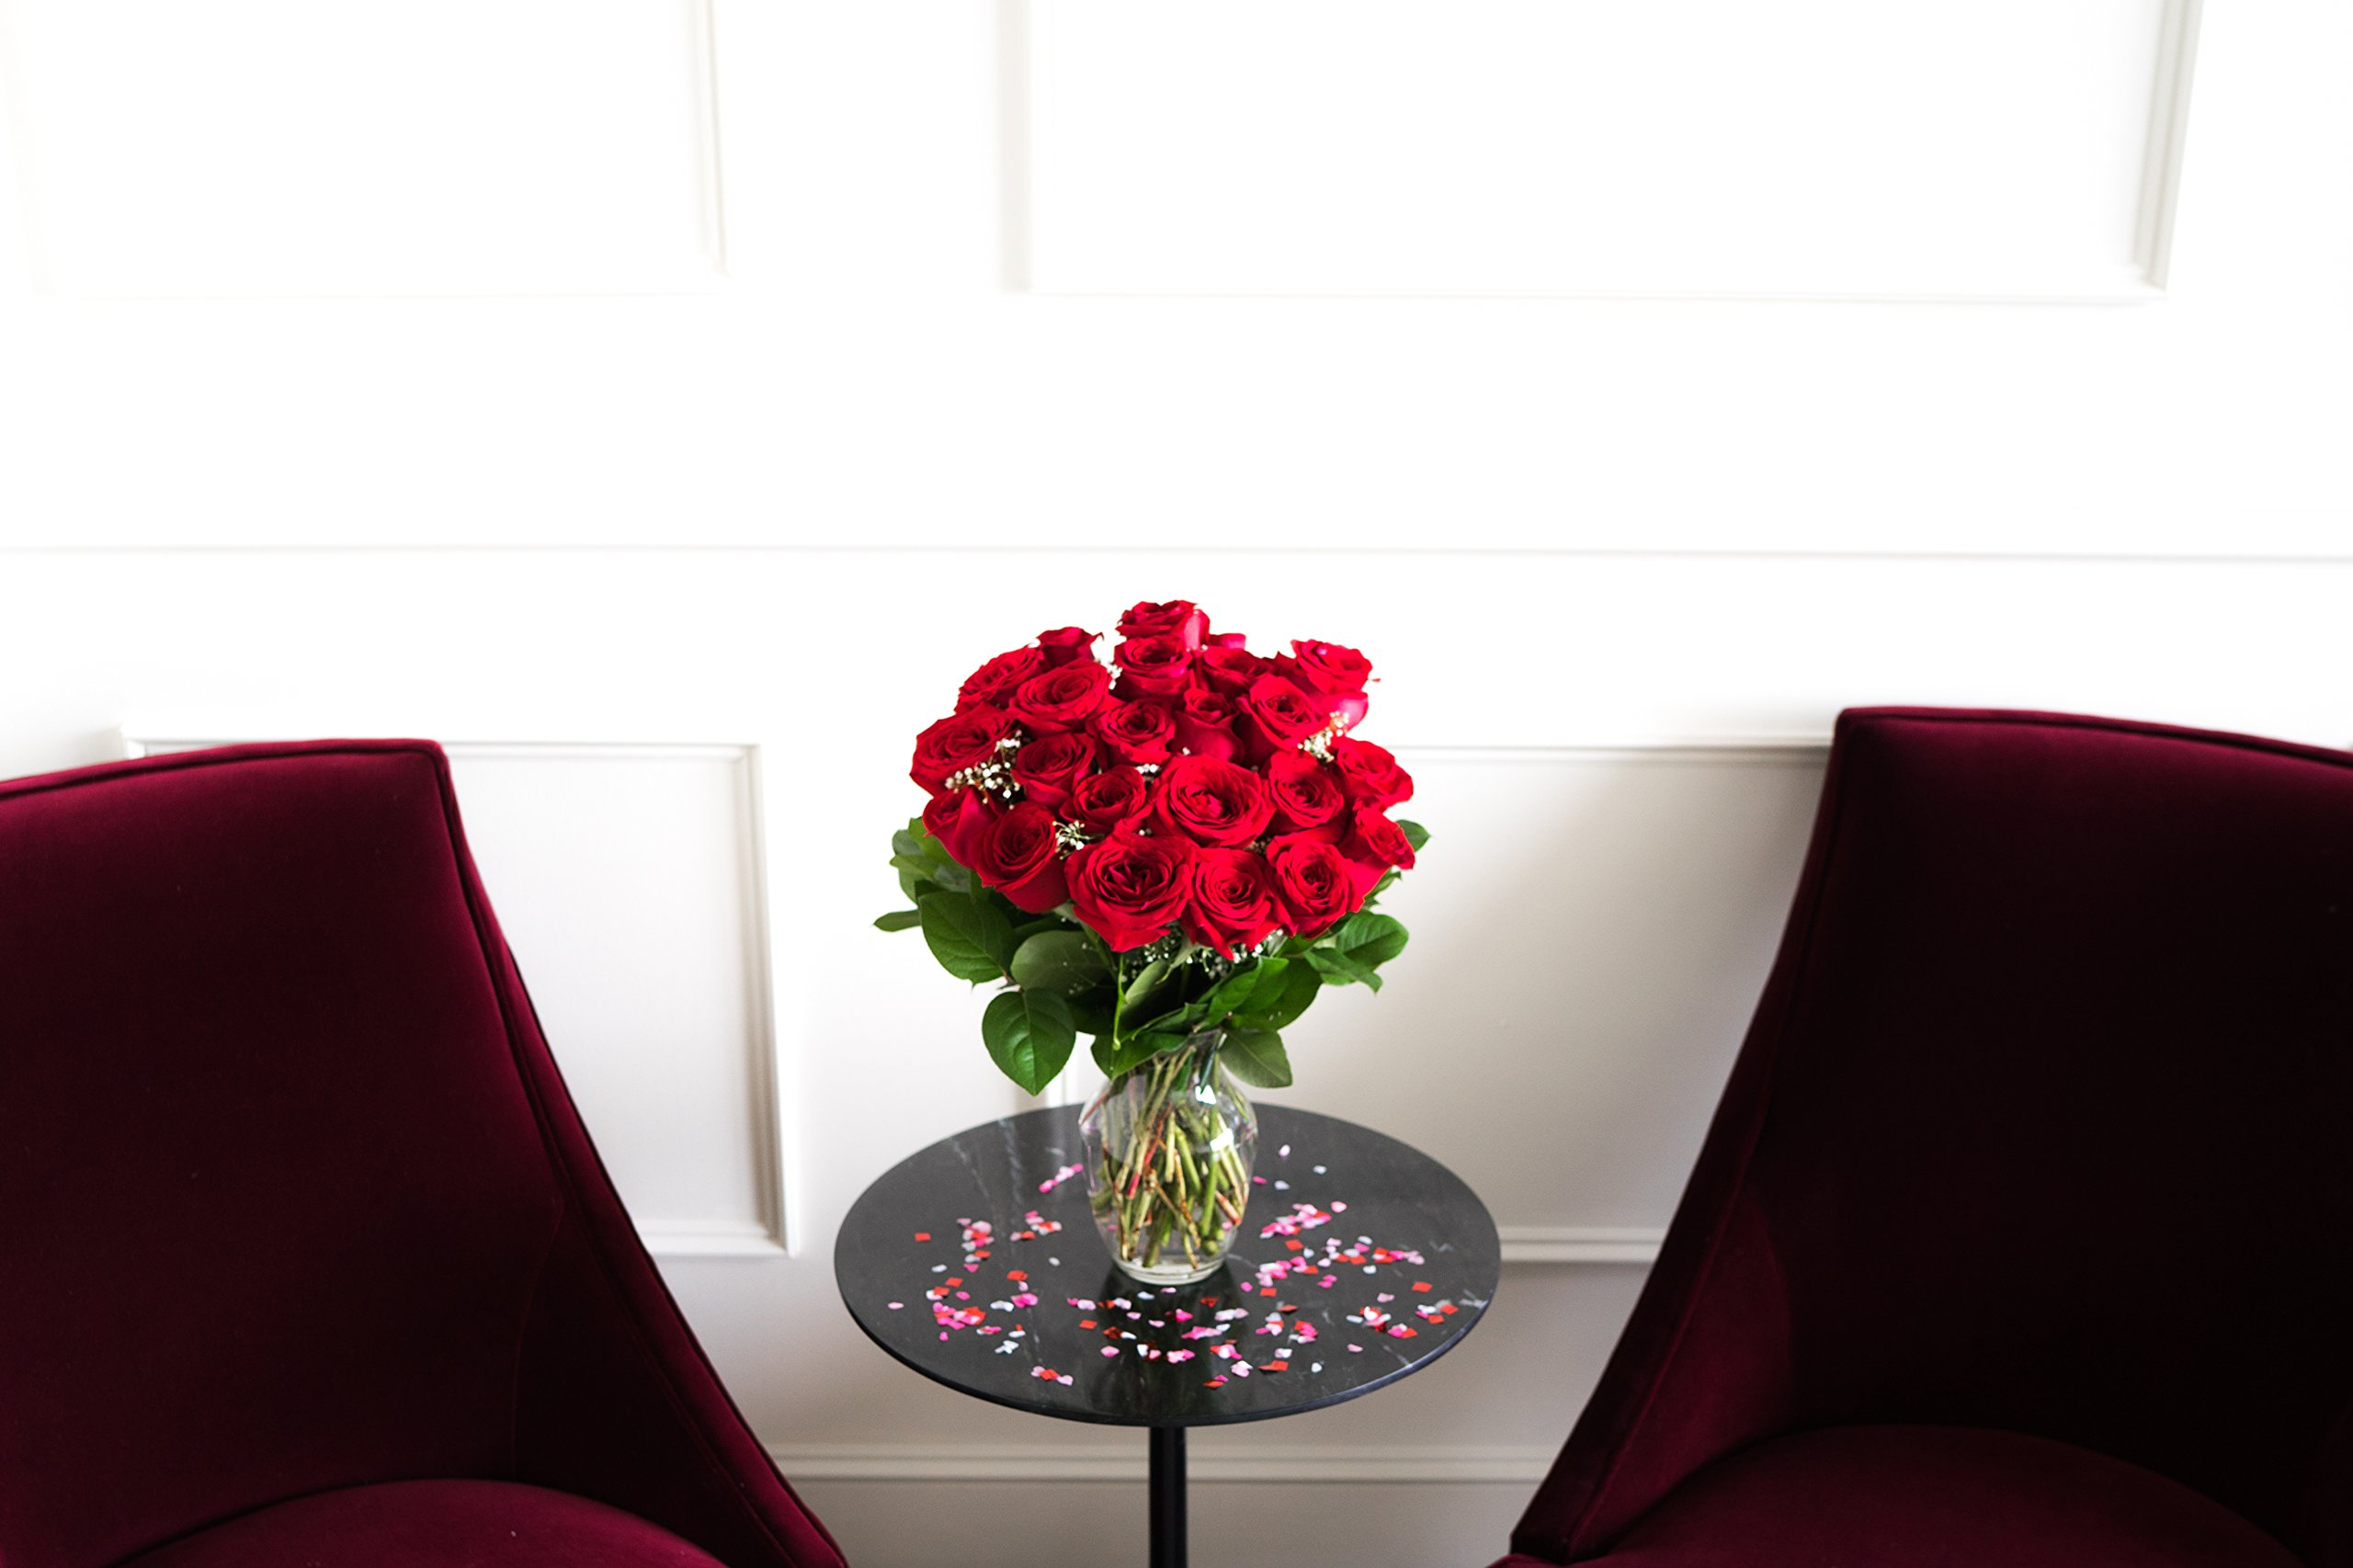 Flowers - Two Dozen Long Stemmed Red Roses (Free Vase Included)